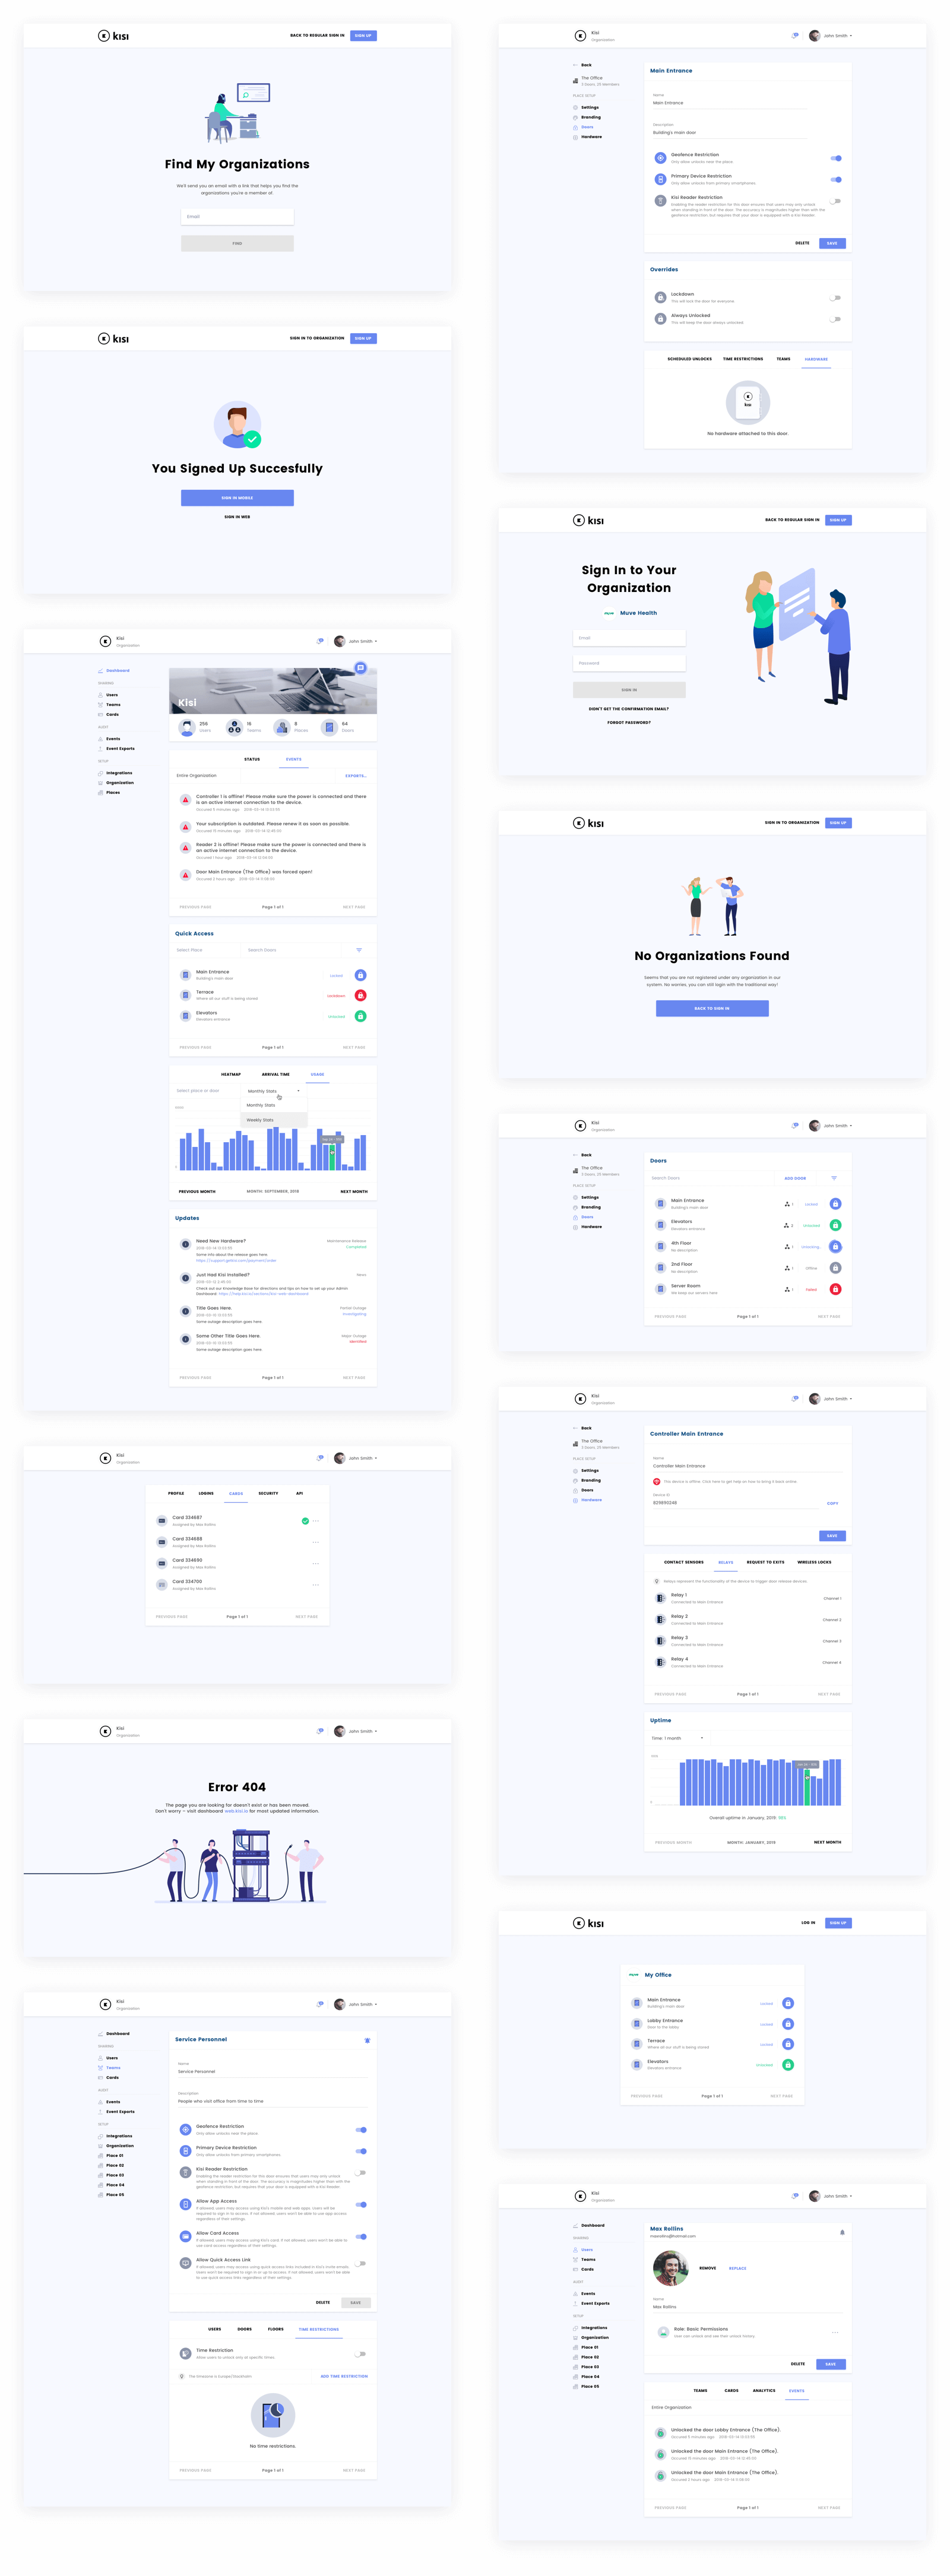 Kisi web app